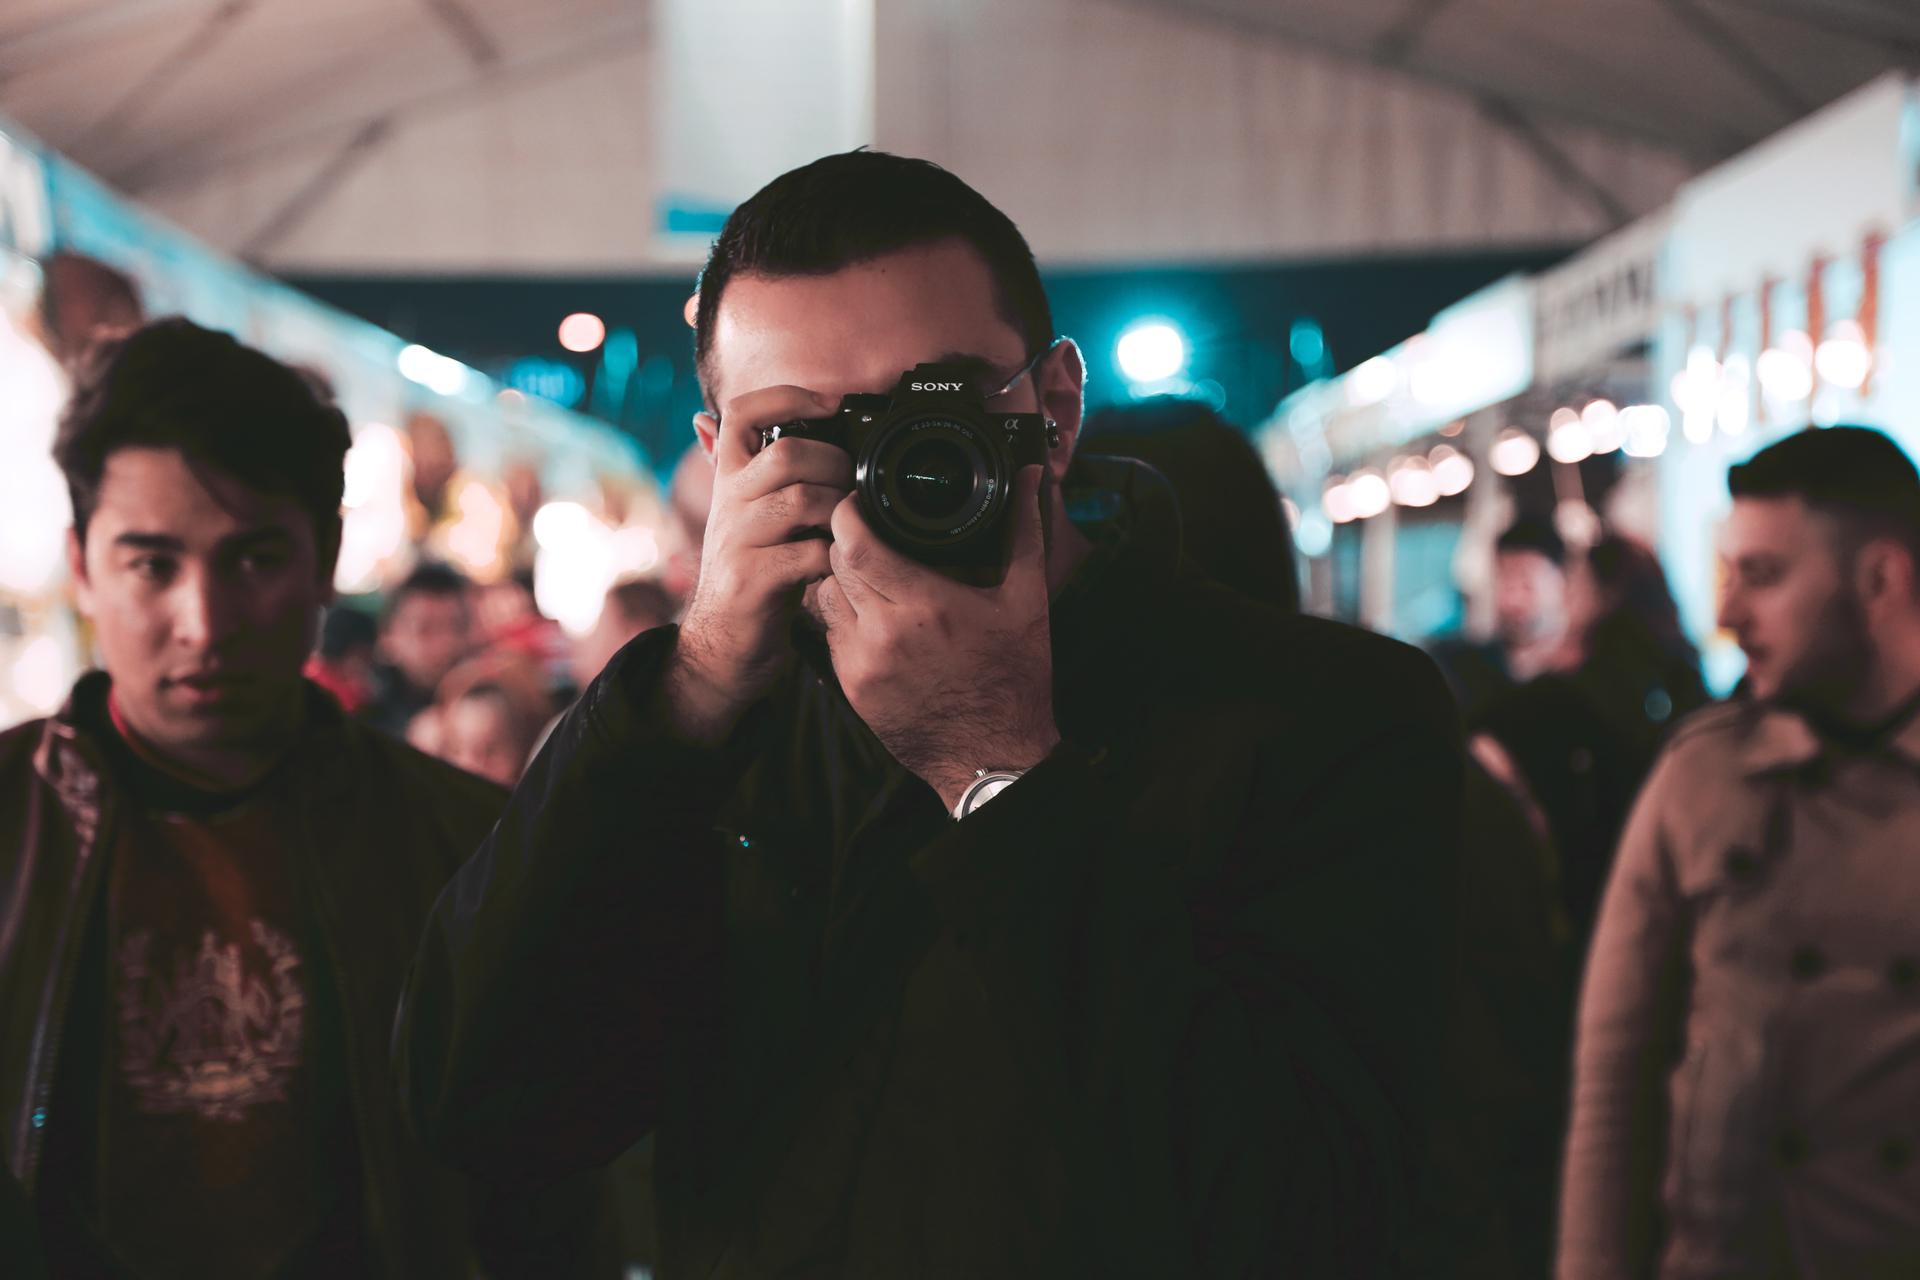 Sony A7r ii هل تعتبر من أفضل الكاميرات؟ هنا تجربتي للكاميرا خلال سنتين